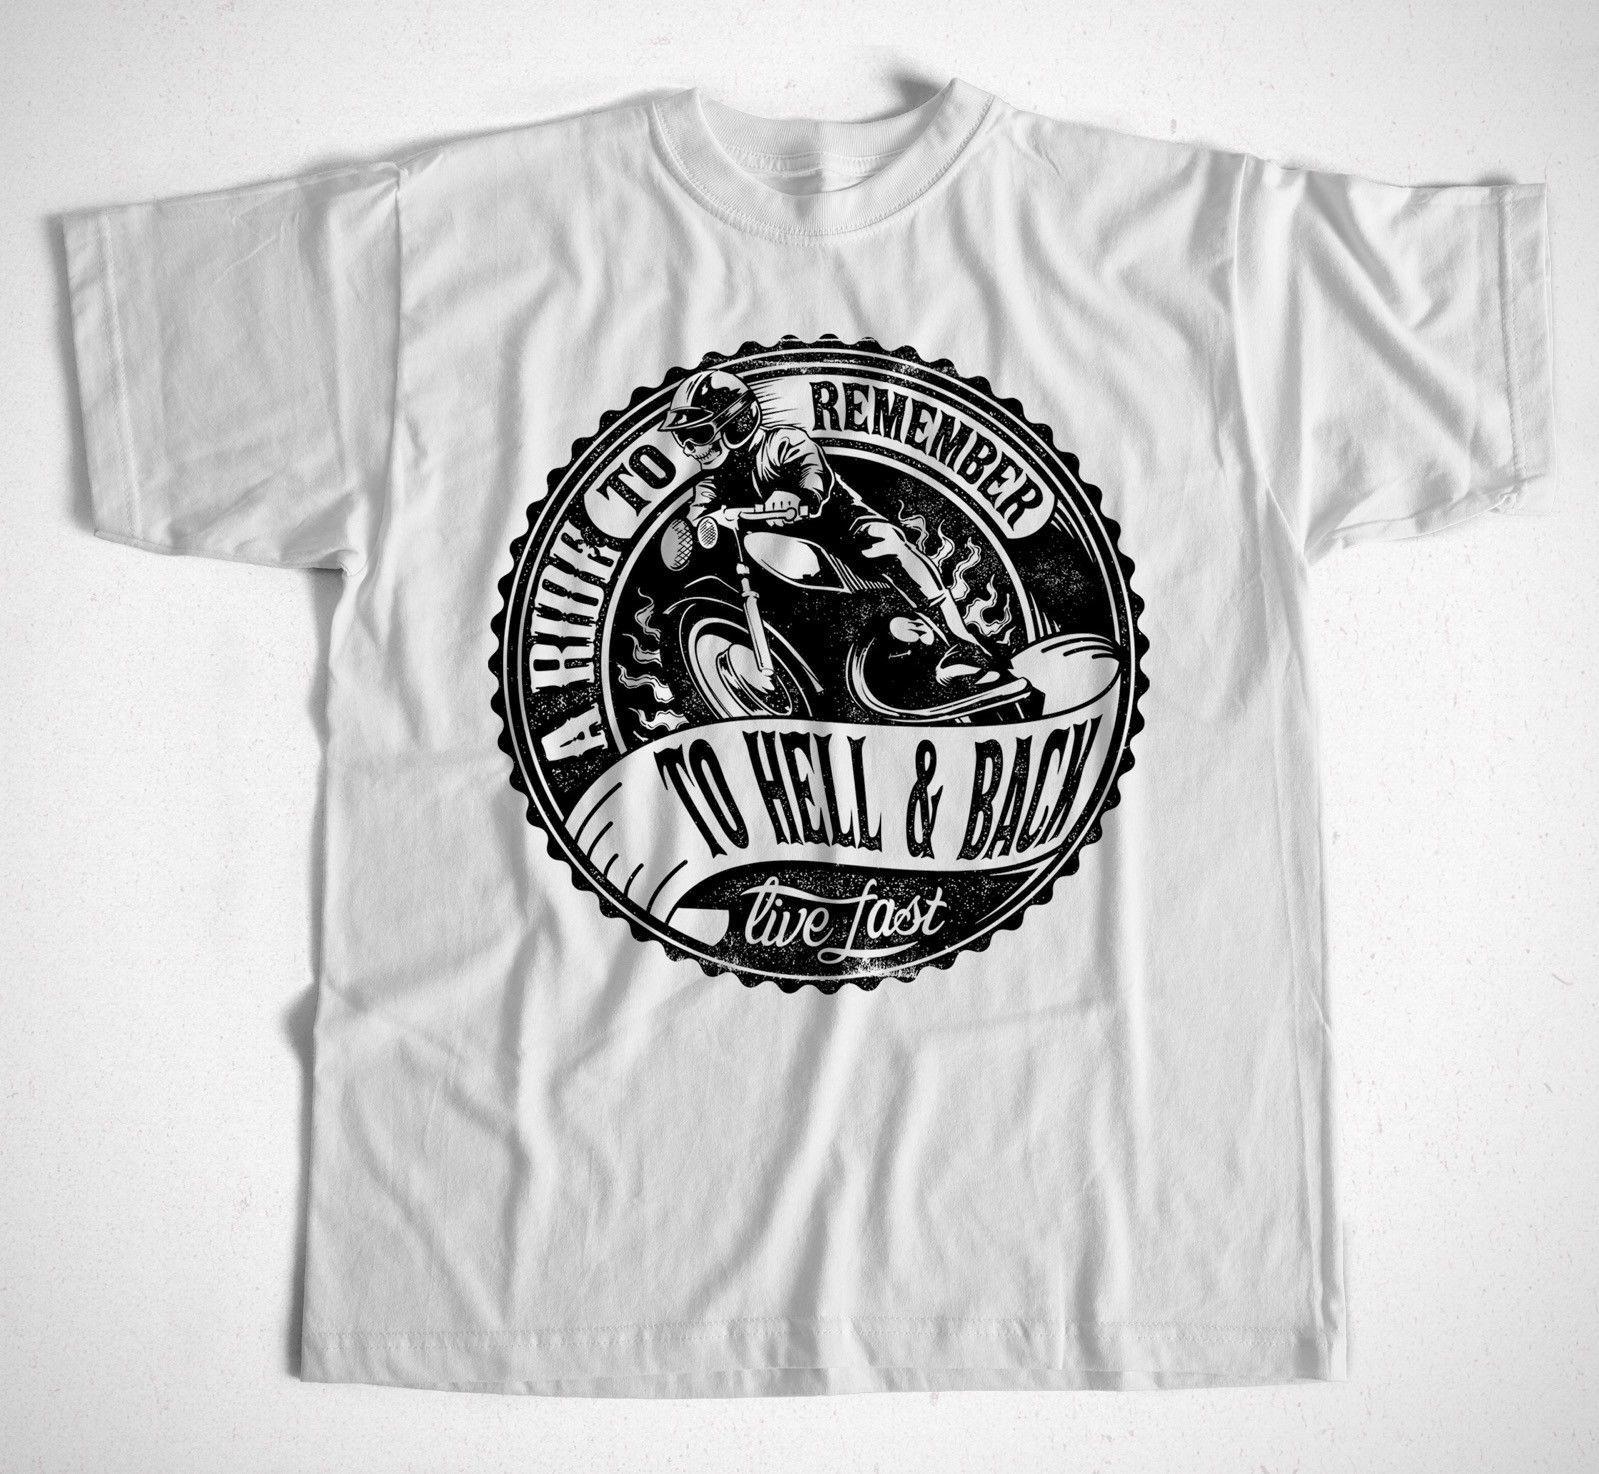 a8ace56bd T-Shirt 73 S-4XL CafeRacer Route 66 Biker Custom Motorcross Motorrad Kult  Rocker Online with  13.15 Piece on Notkillape s Store